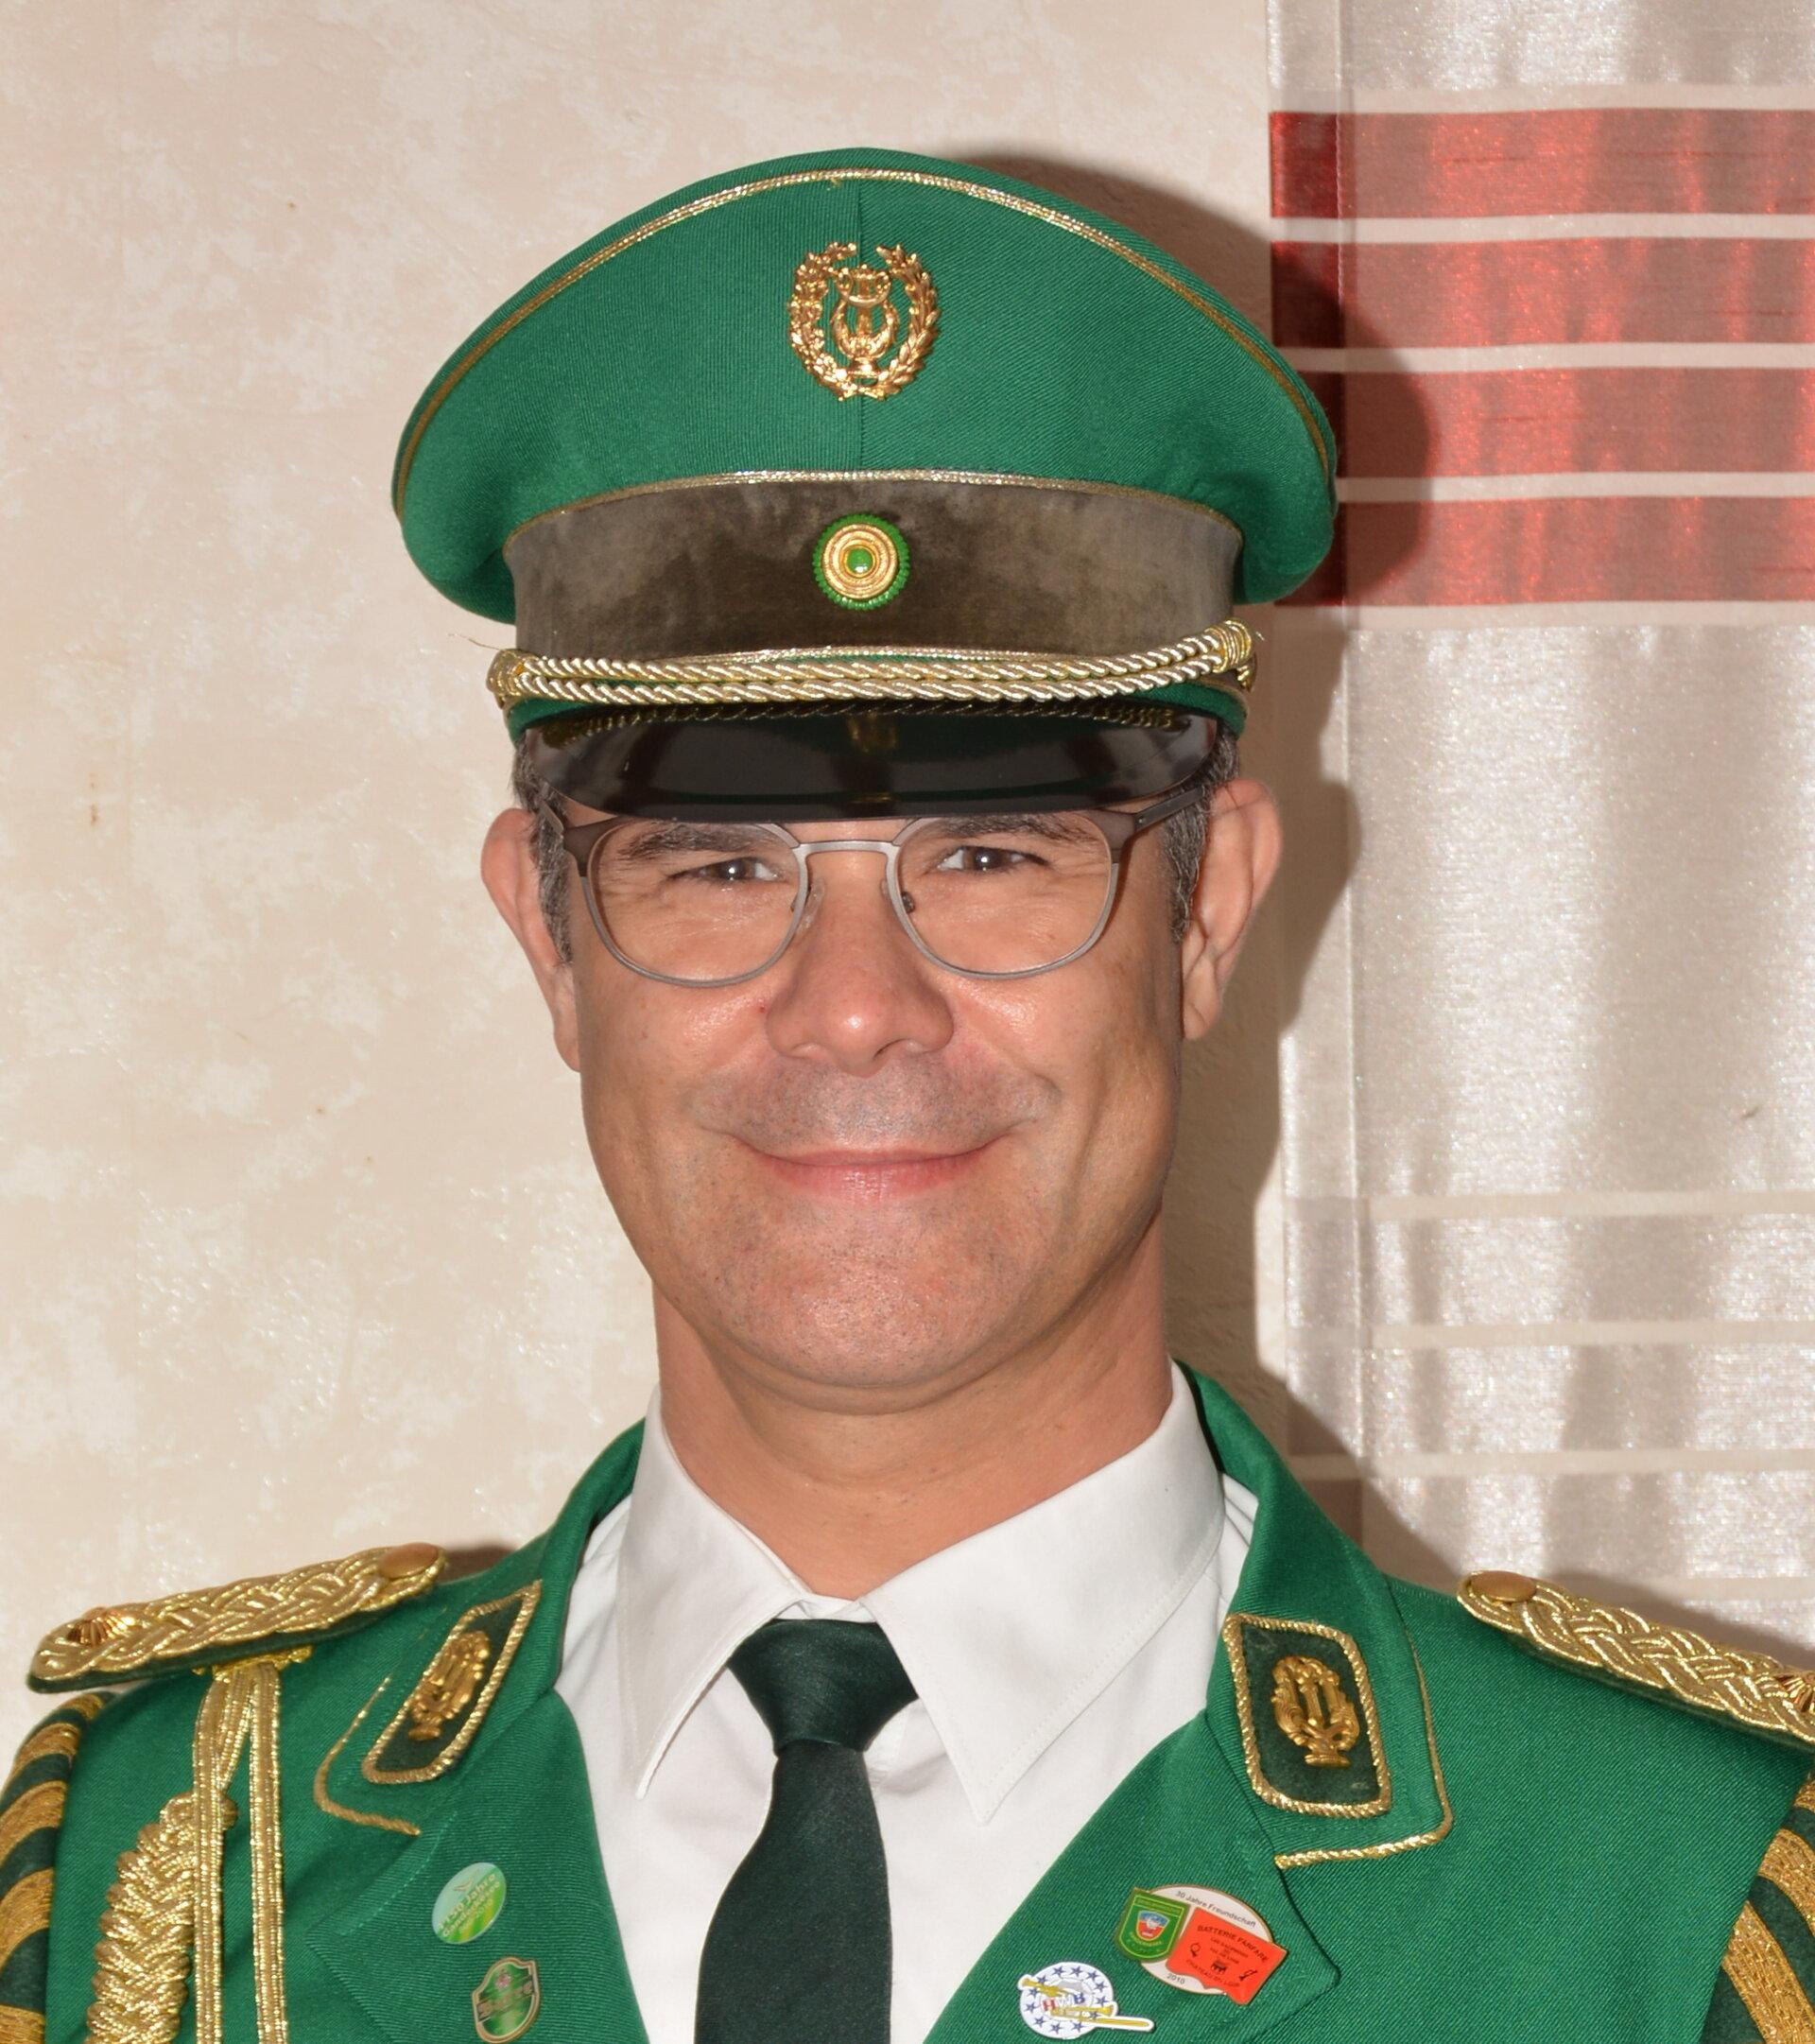 Mattias Wienand